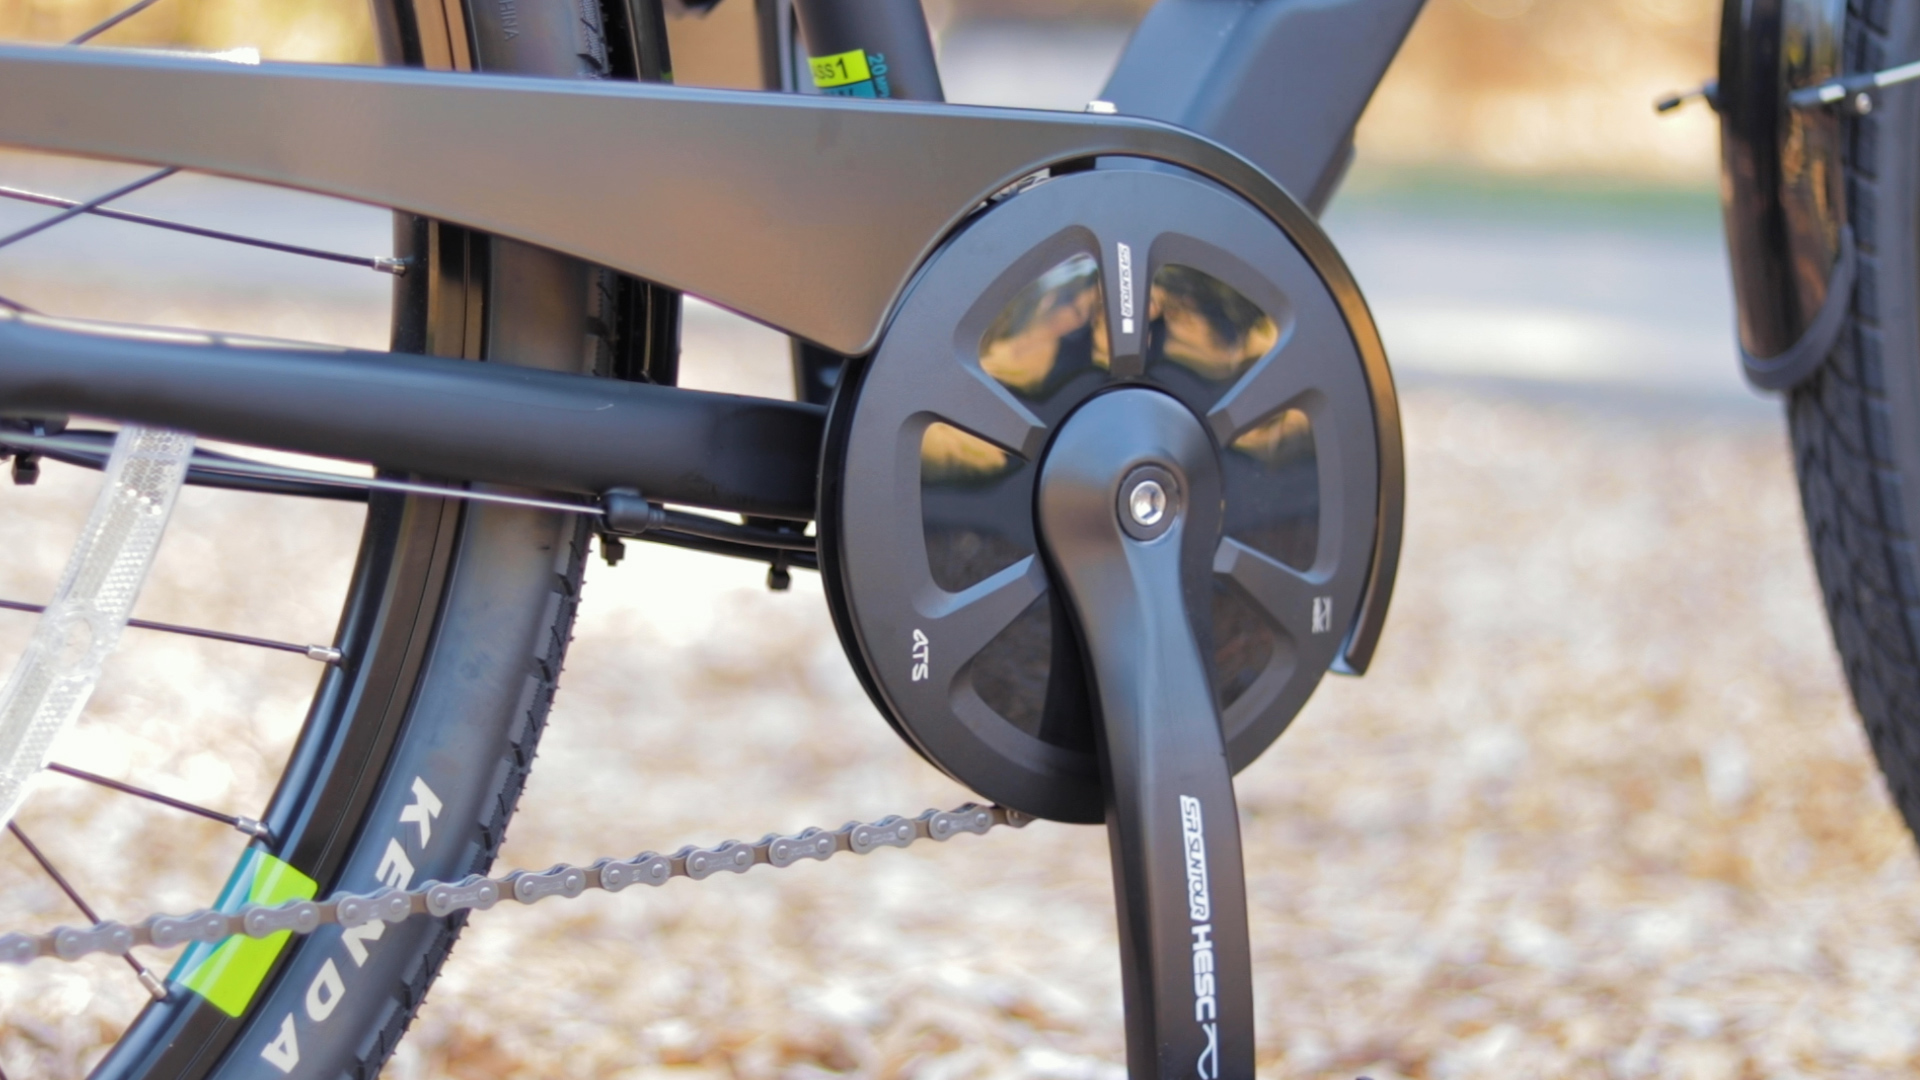 electrified-reviews-izip-e3-brio-electric-bike-review-sensor.jpg